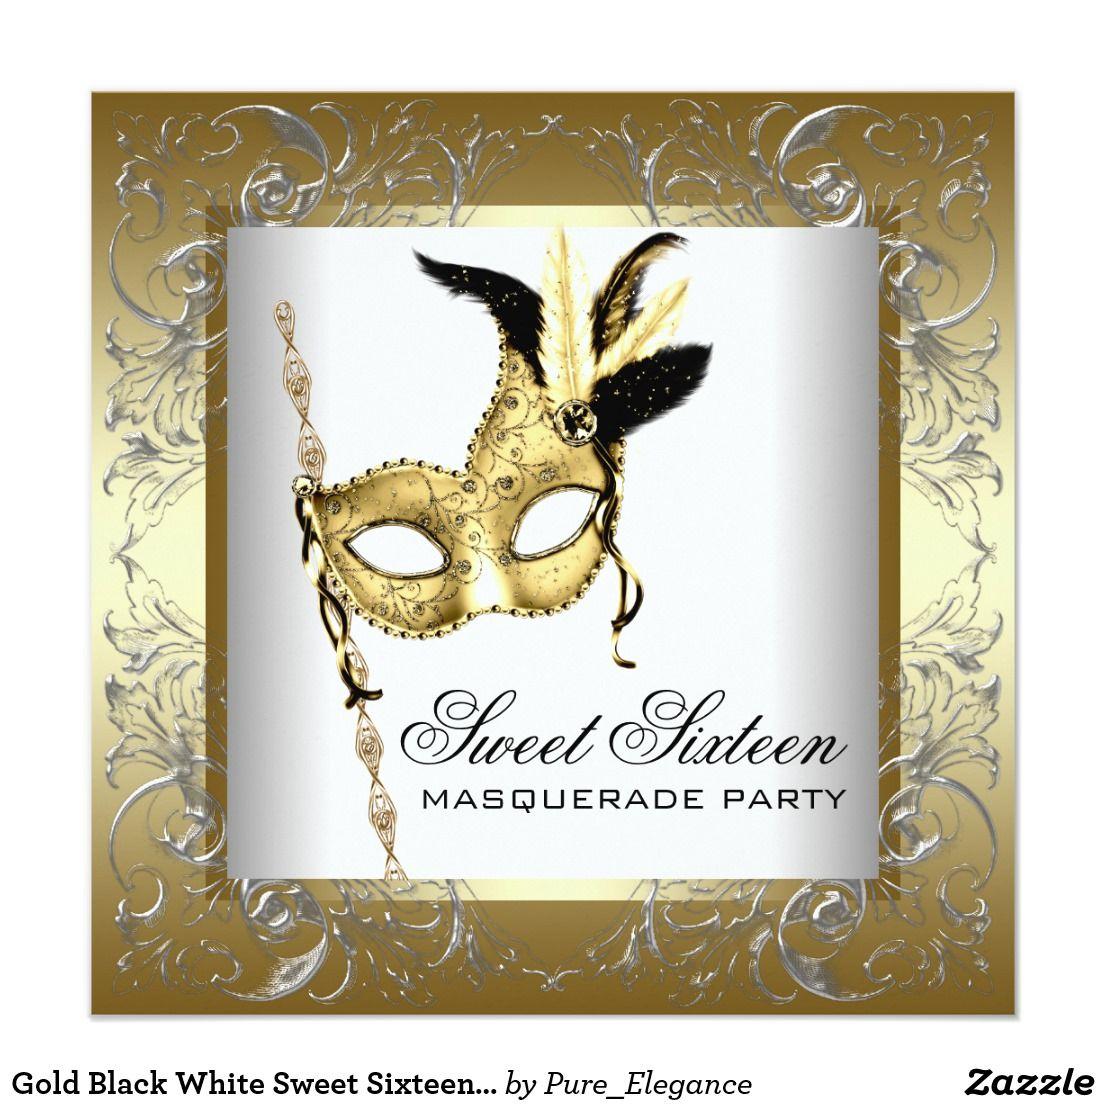 Gold Black White Sweet Sixteen Masquerade Party Invitation